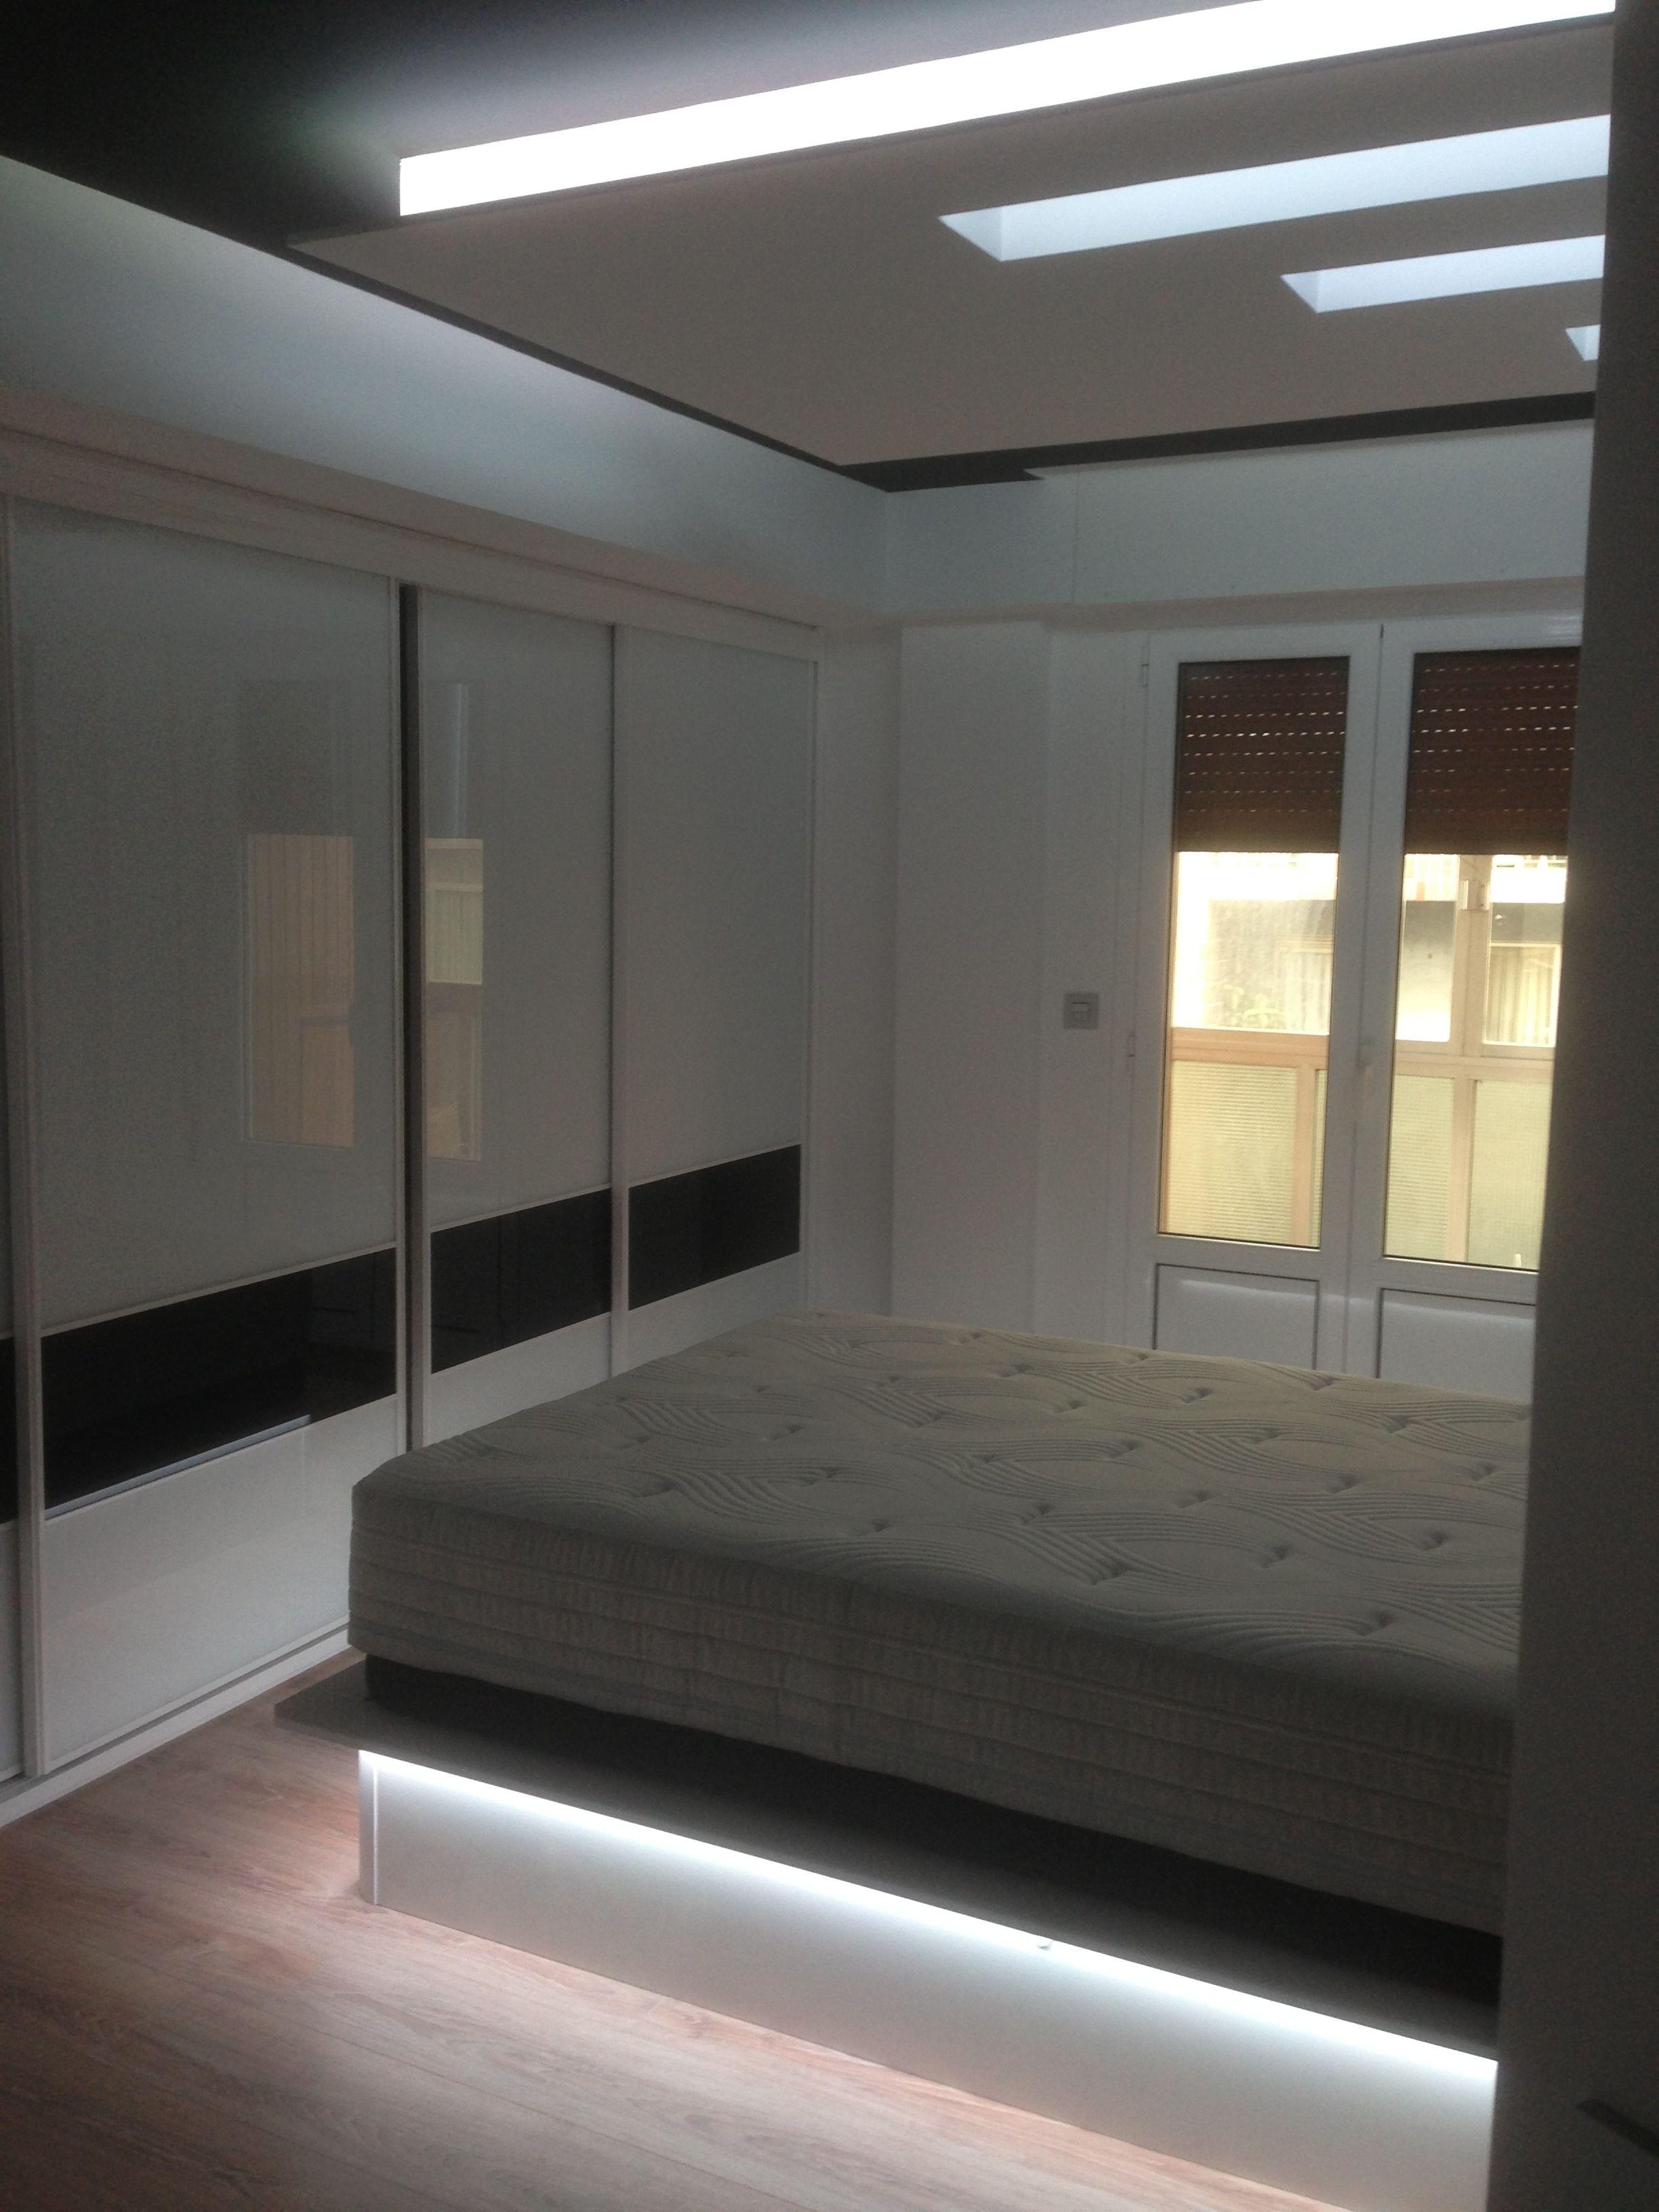 canap y foseado de dormitorio iluminados con tira de leds rgb - Canape Design Led